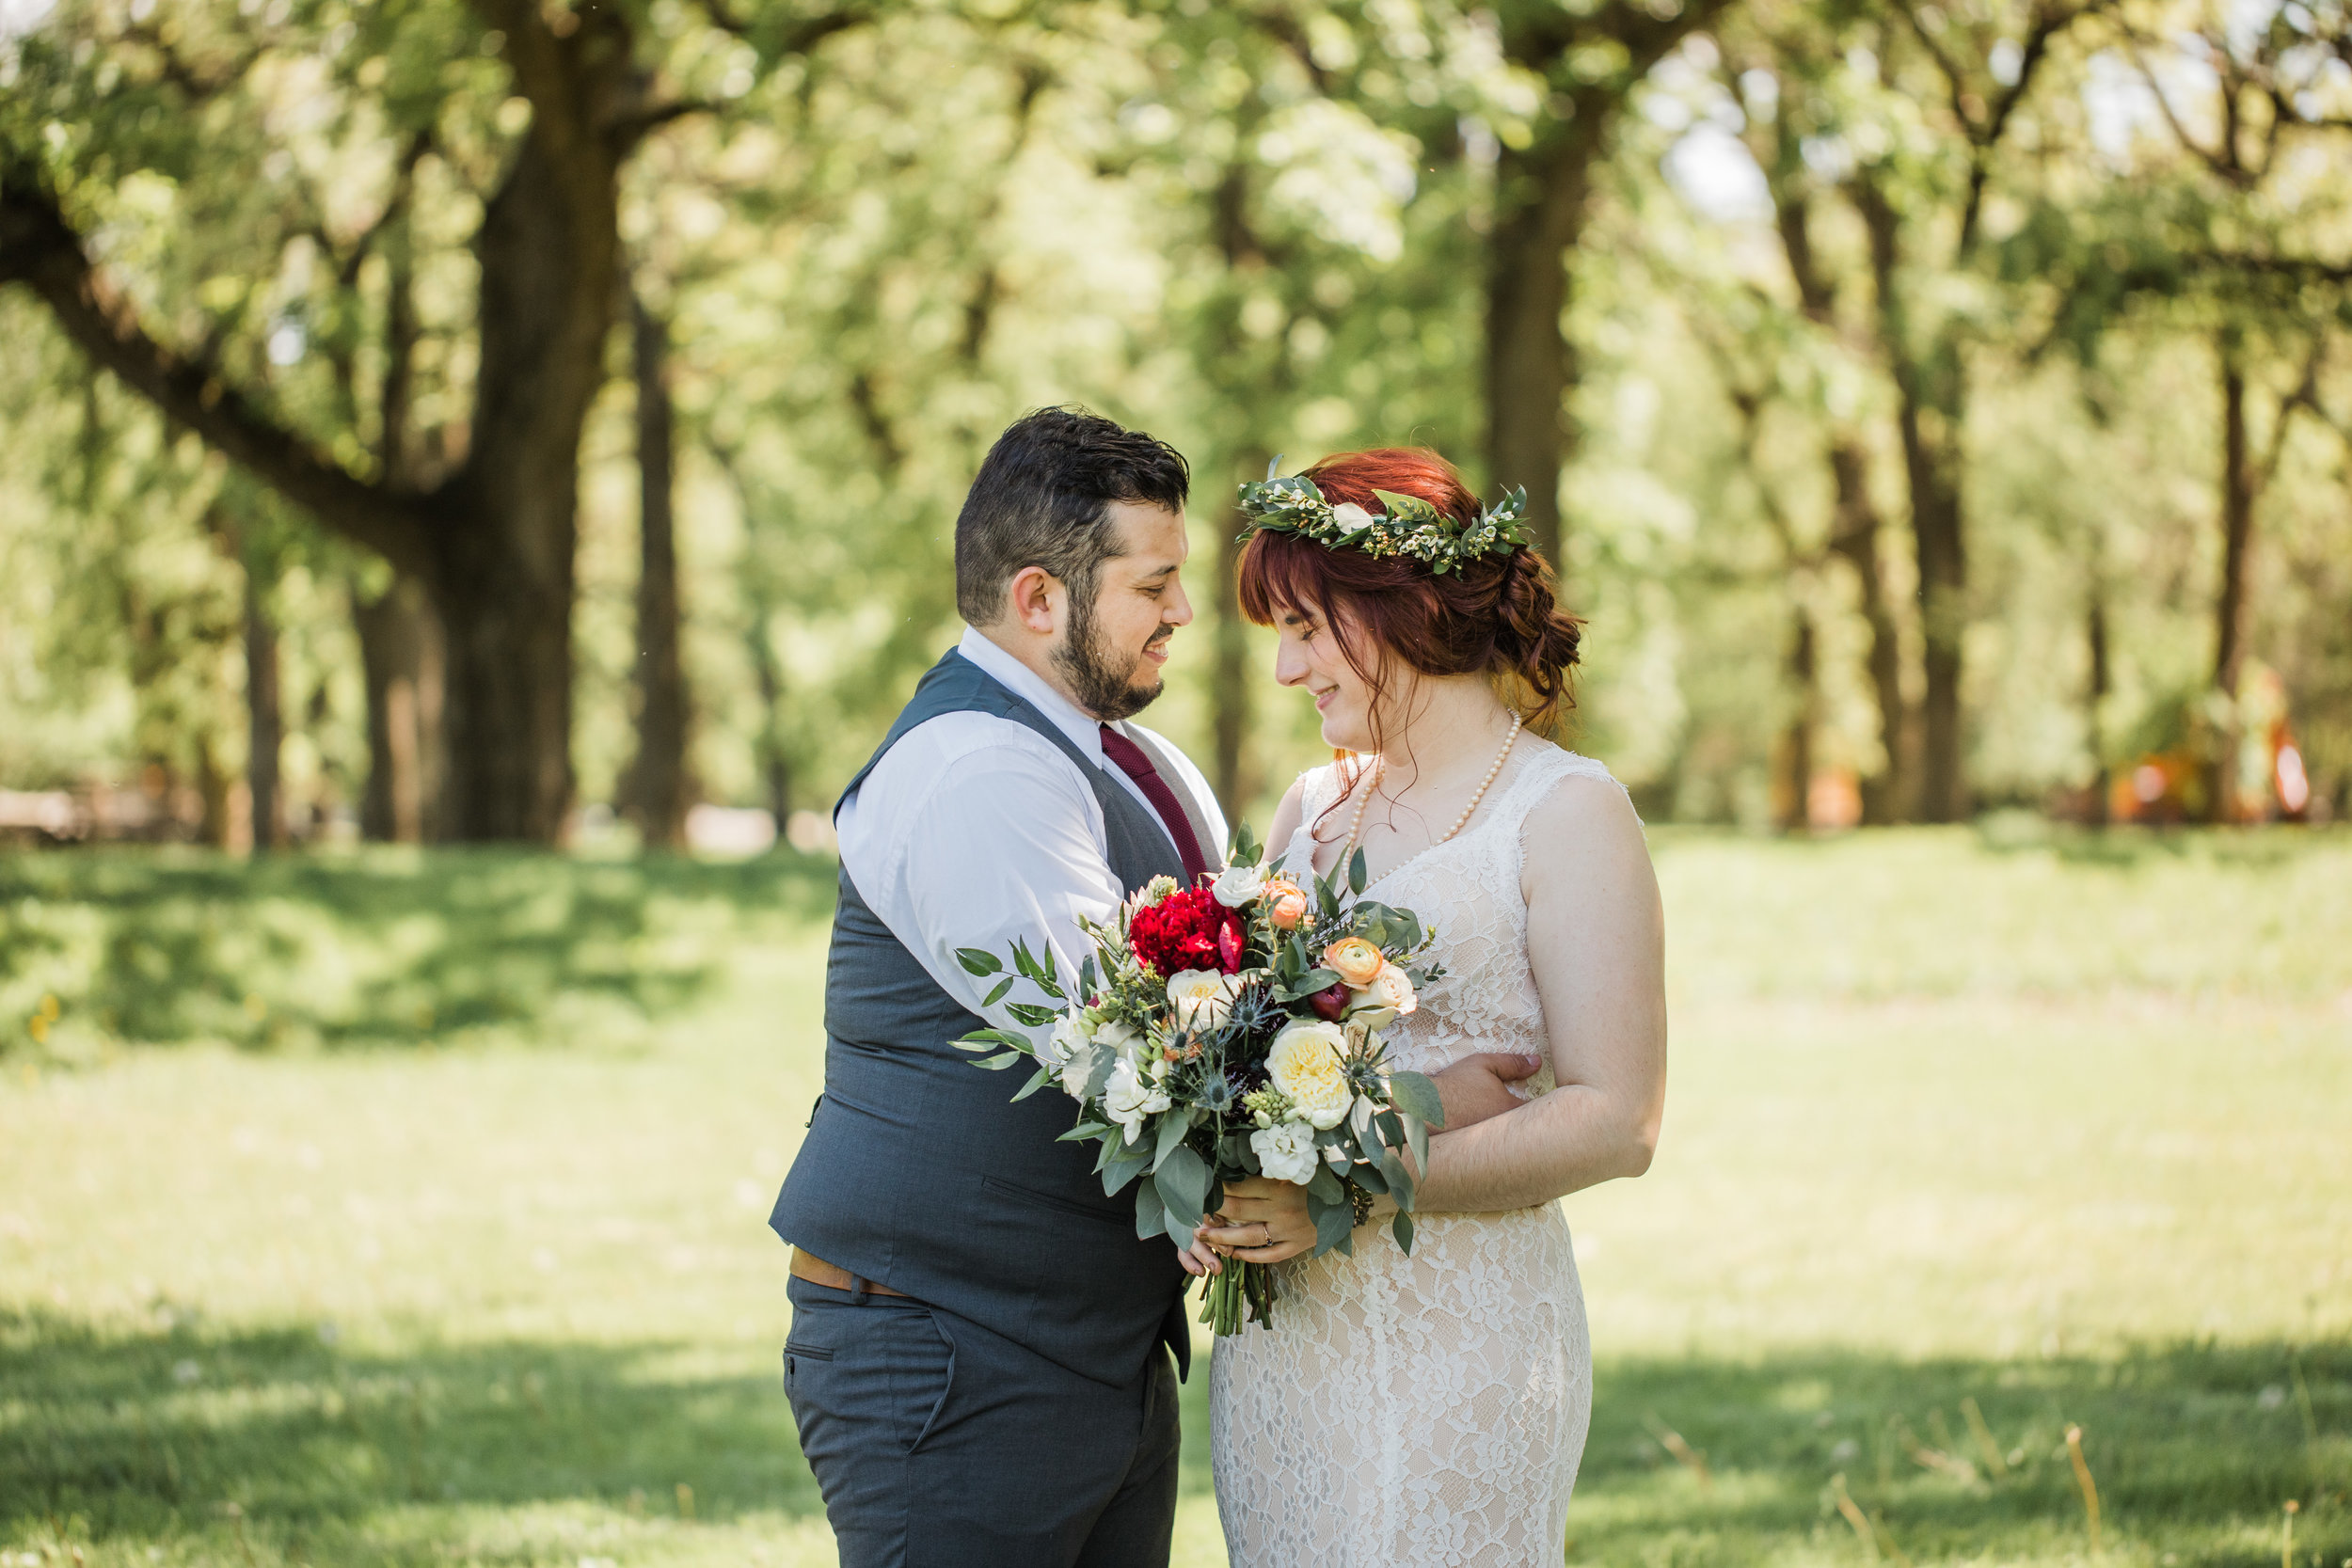 romantic iowa outdoors wedding first look photos lace dress